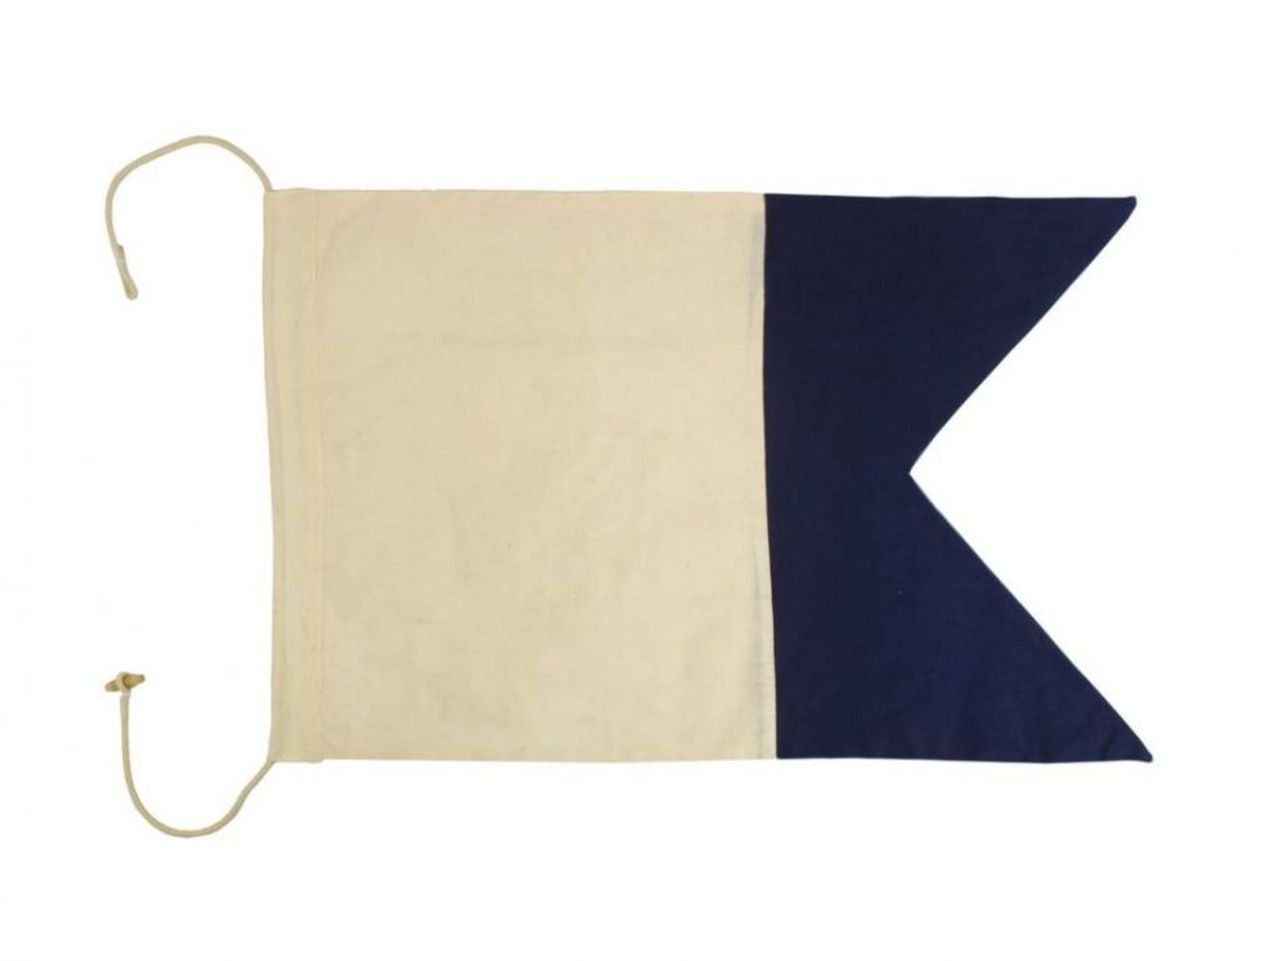 Hampton Nautical  Letter A Nautical Cloth Alphabet Flag, Decor, Home Decoration, Wall Art Tool, 20''